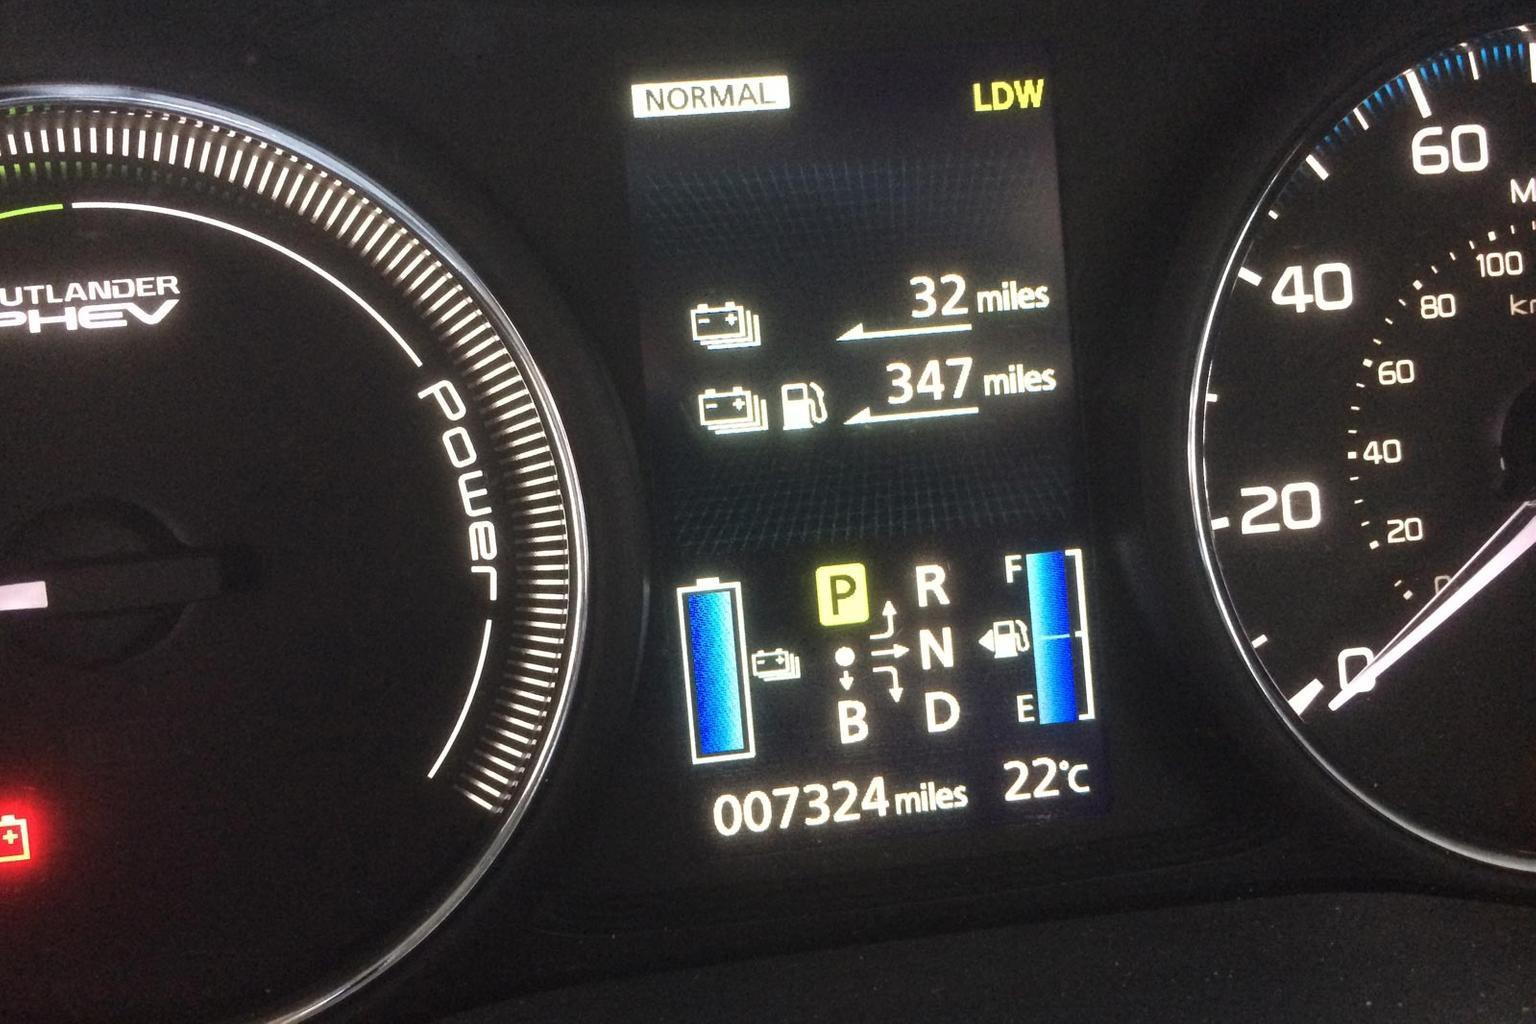 Our cars: Skoda Octavia and Mitsubishi Outlander PHEV